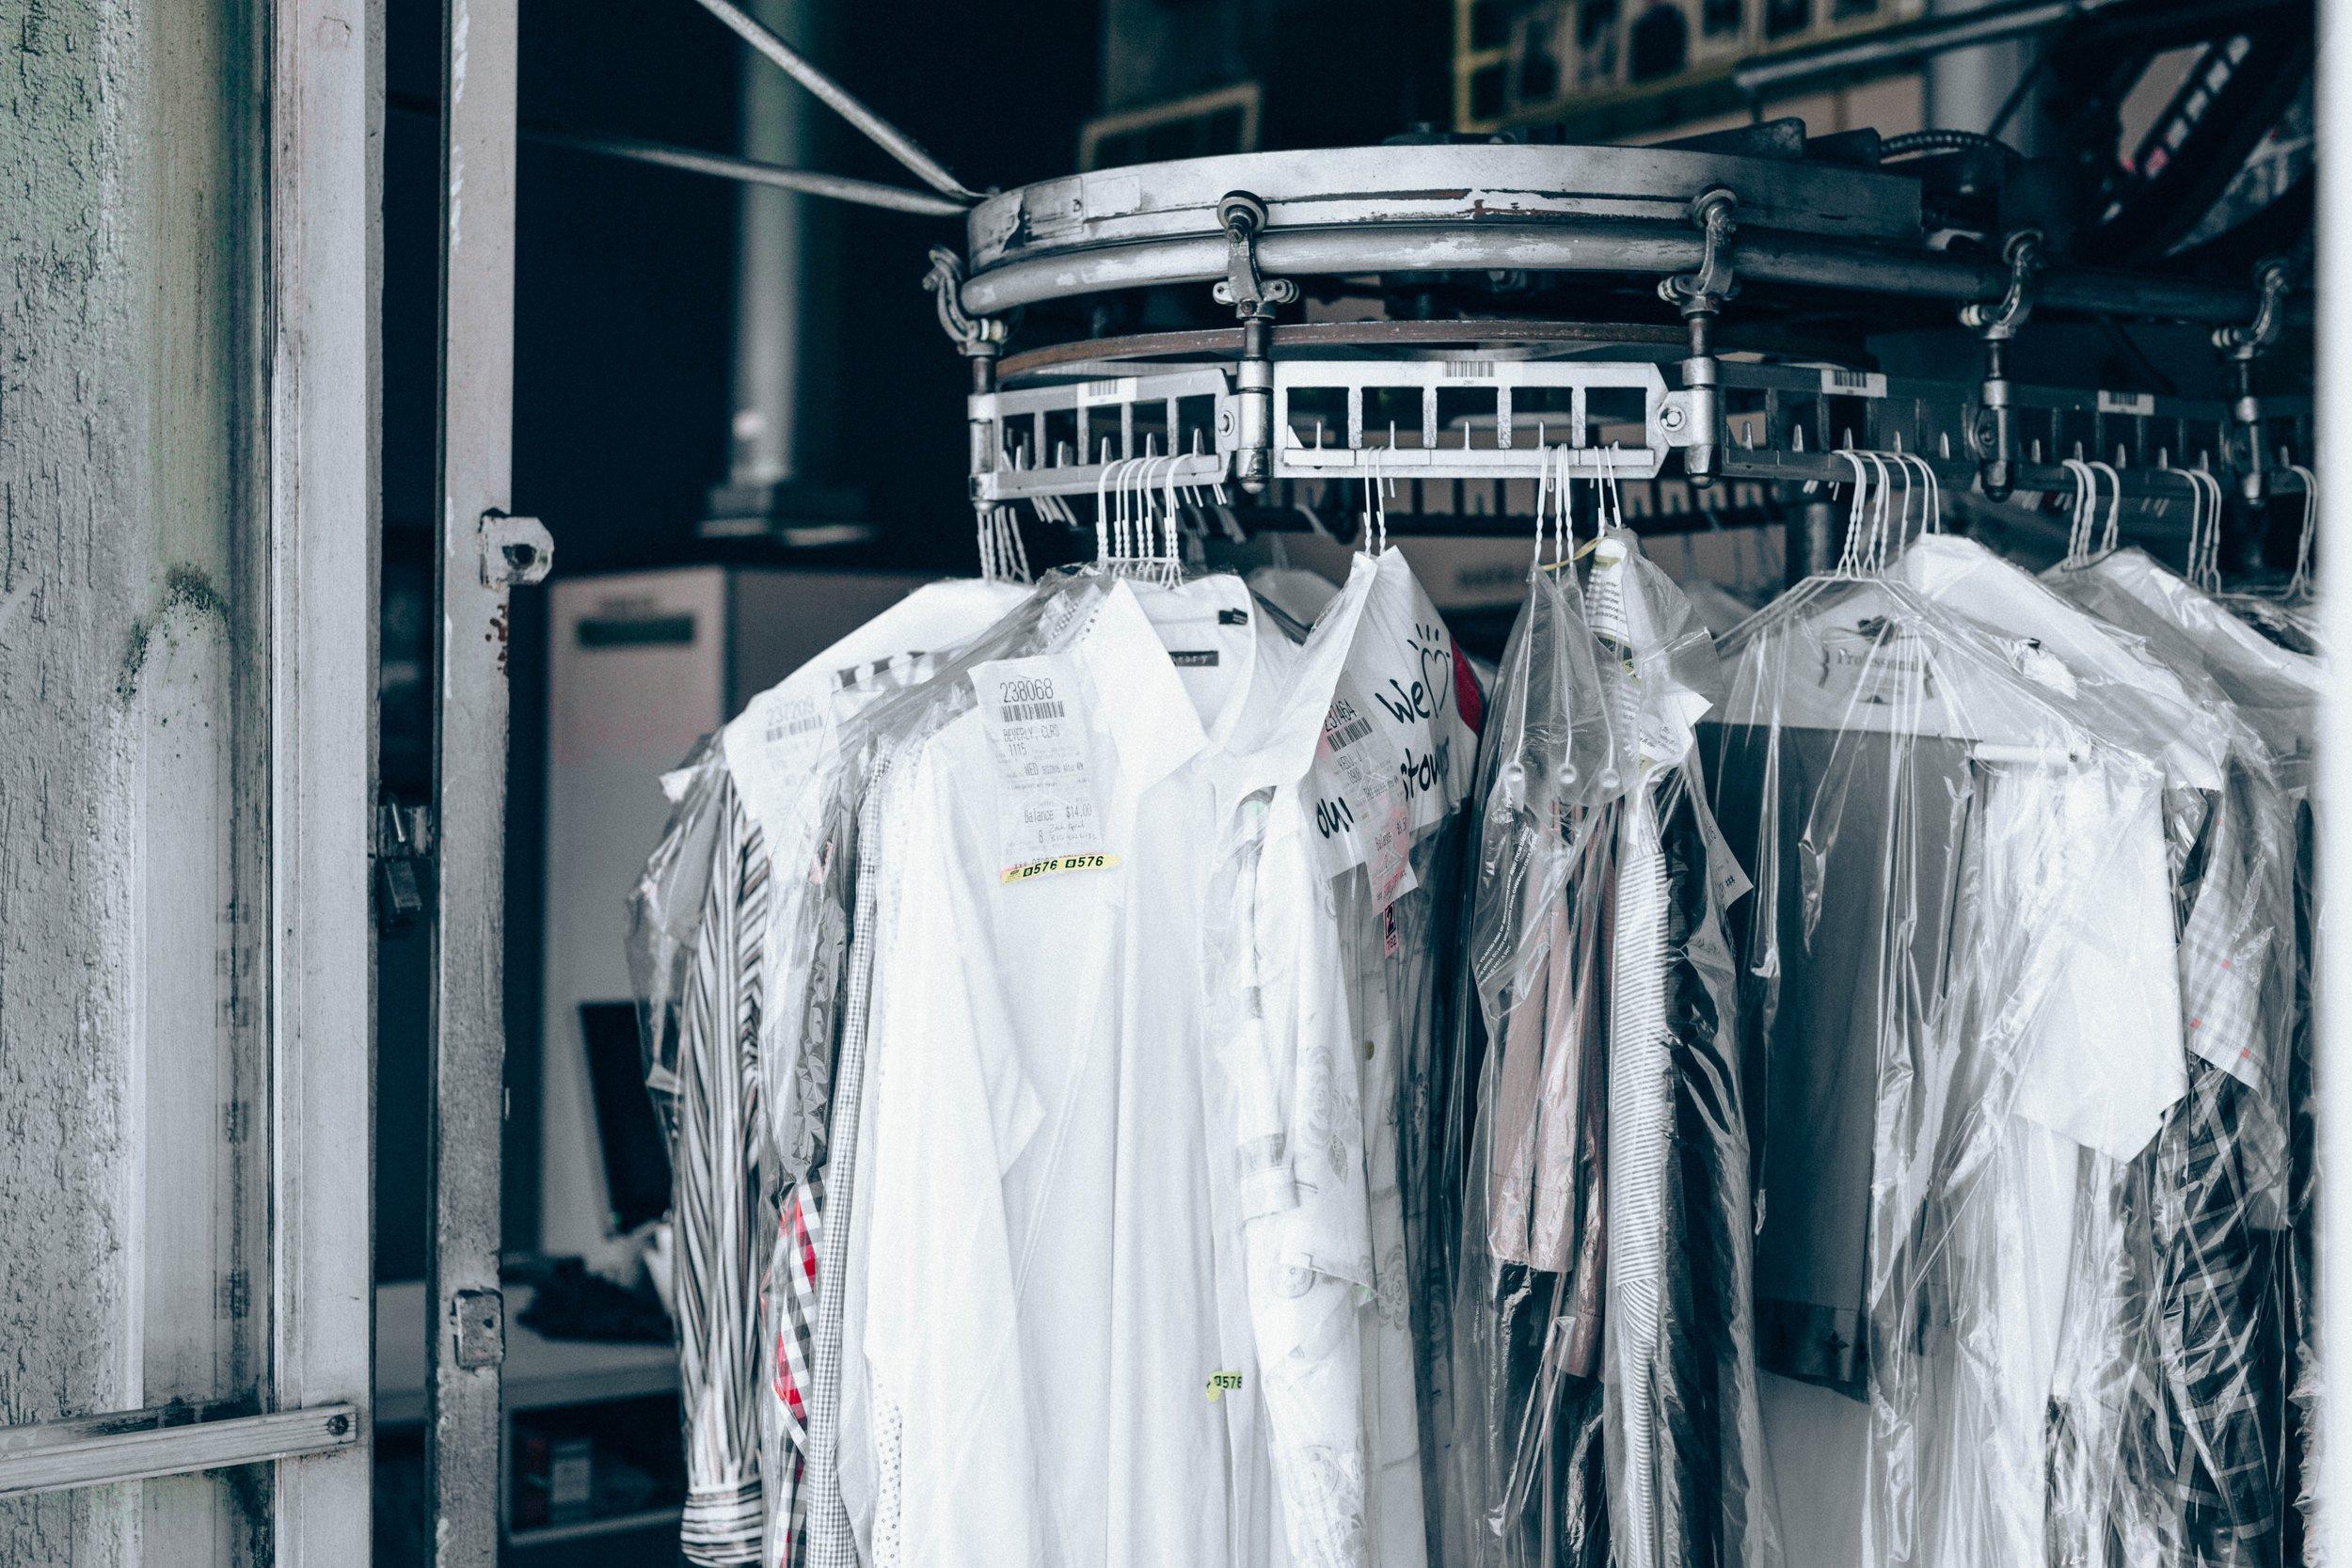 D. Logistics - The Production Process